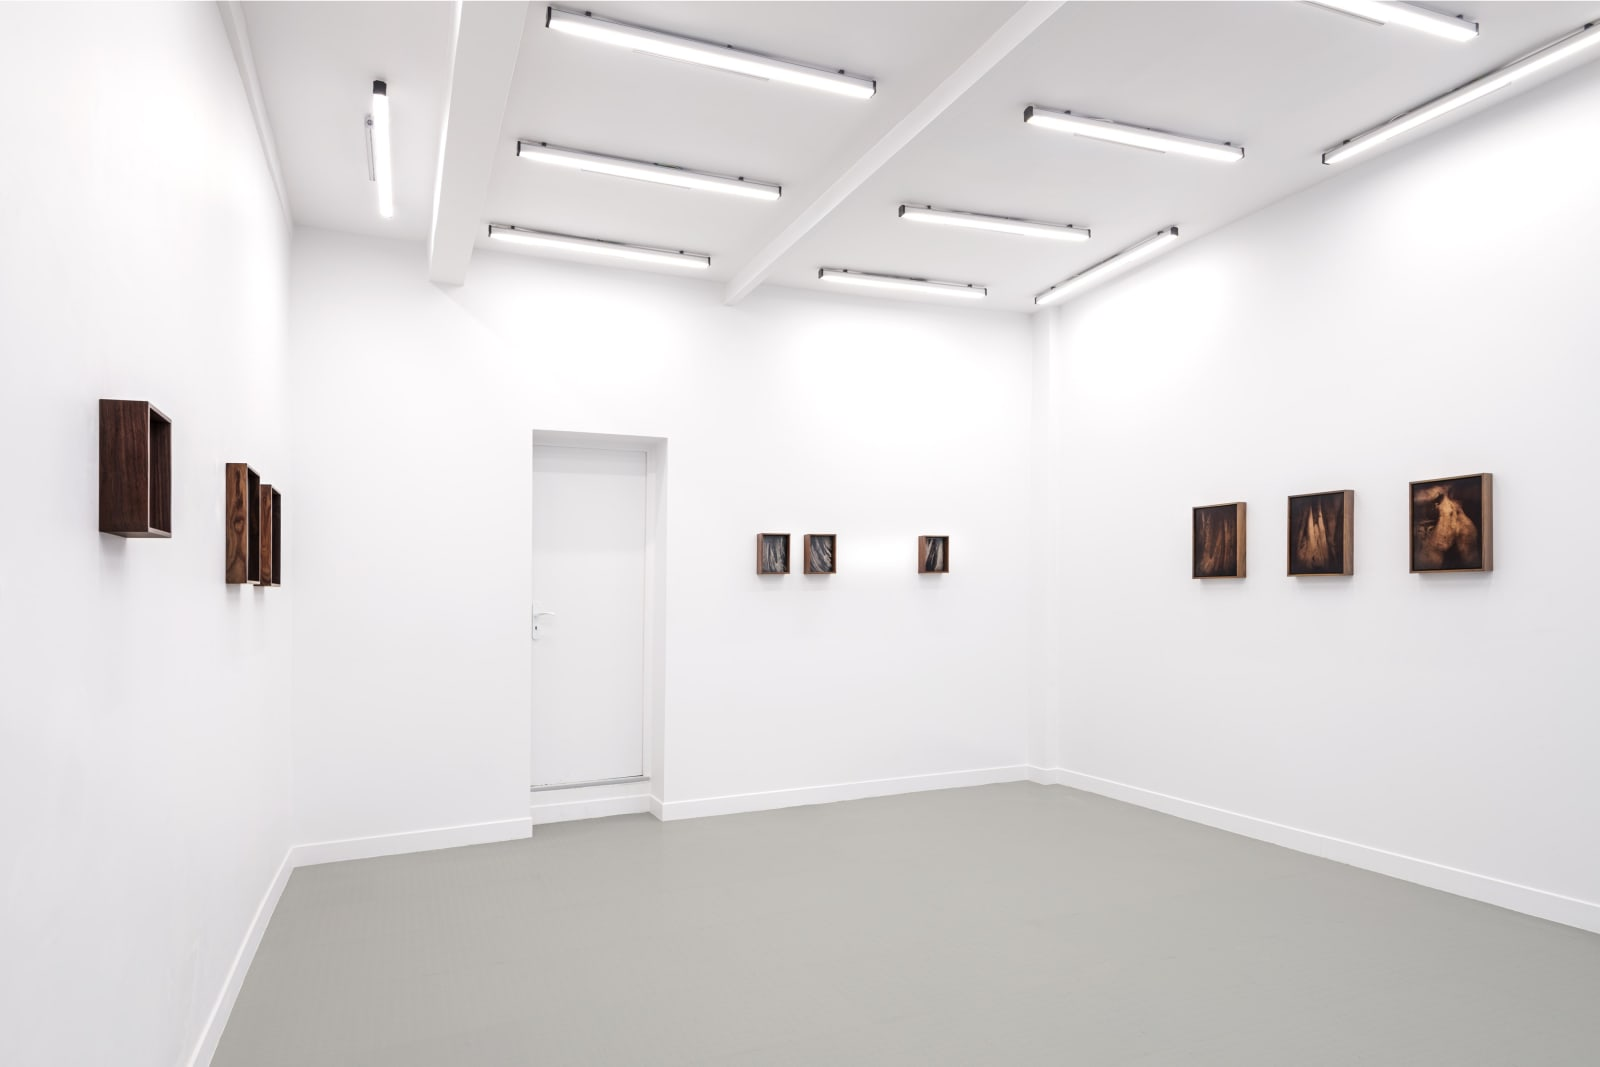 Martín Soto Climent Installation view, Andréhn-Schiptjenko, Paris, France 2021